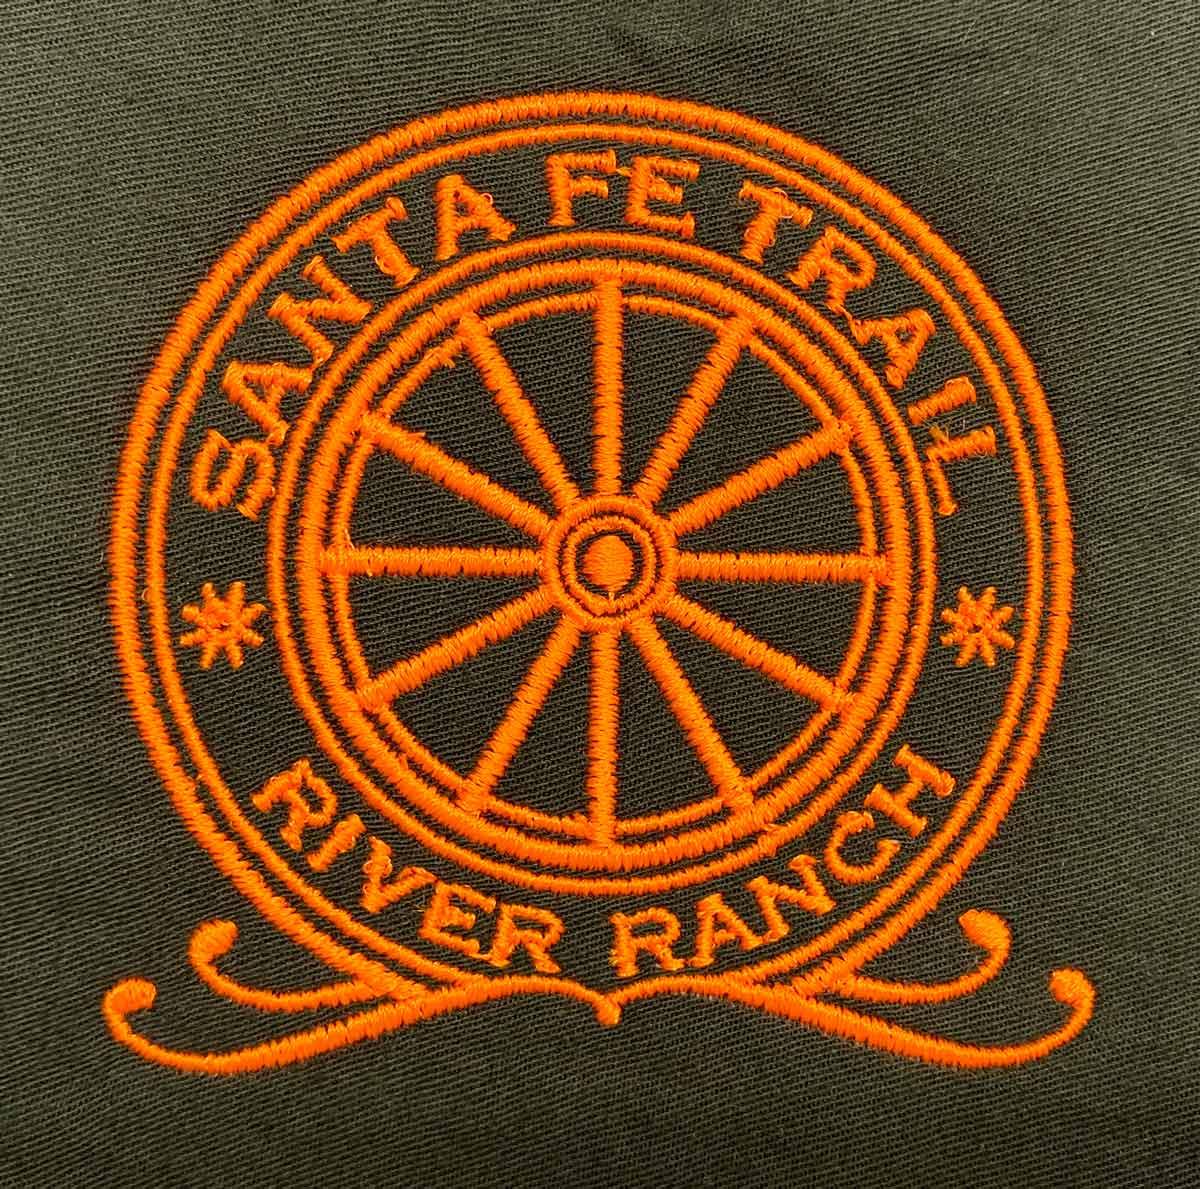 KYC_SANTA-FE-TRAIL-RIVER-RANCH_web.jpg